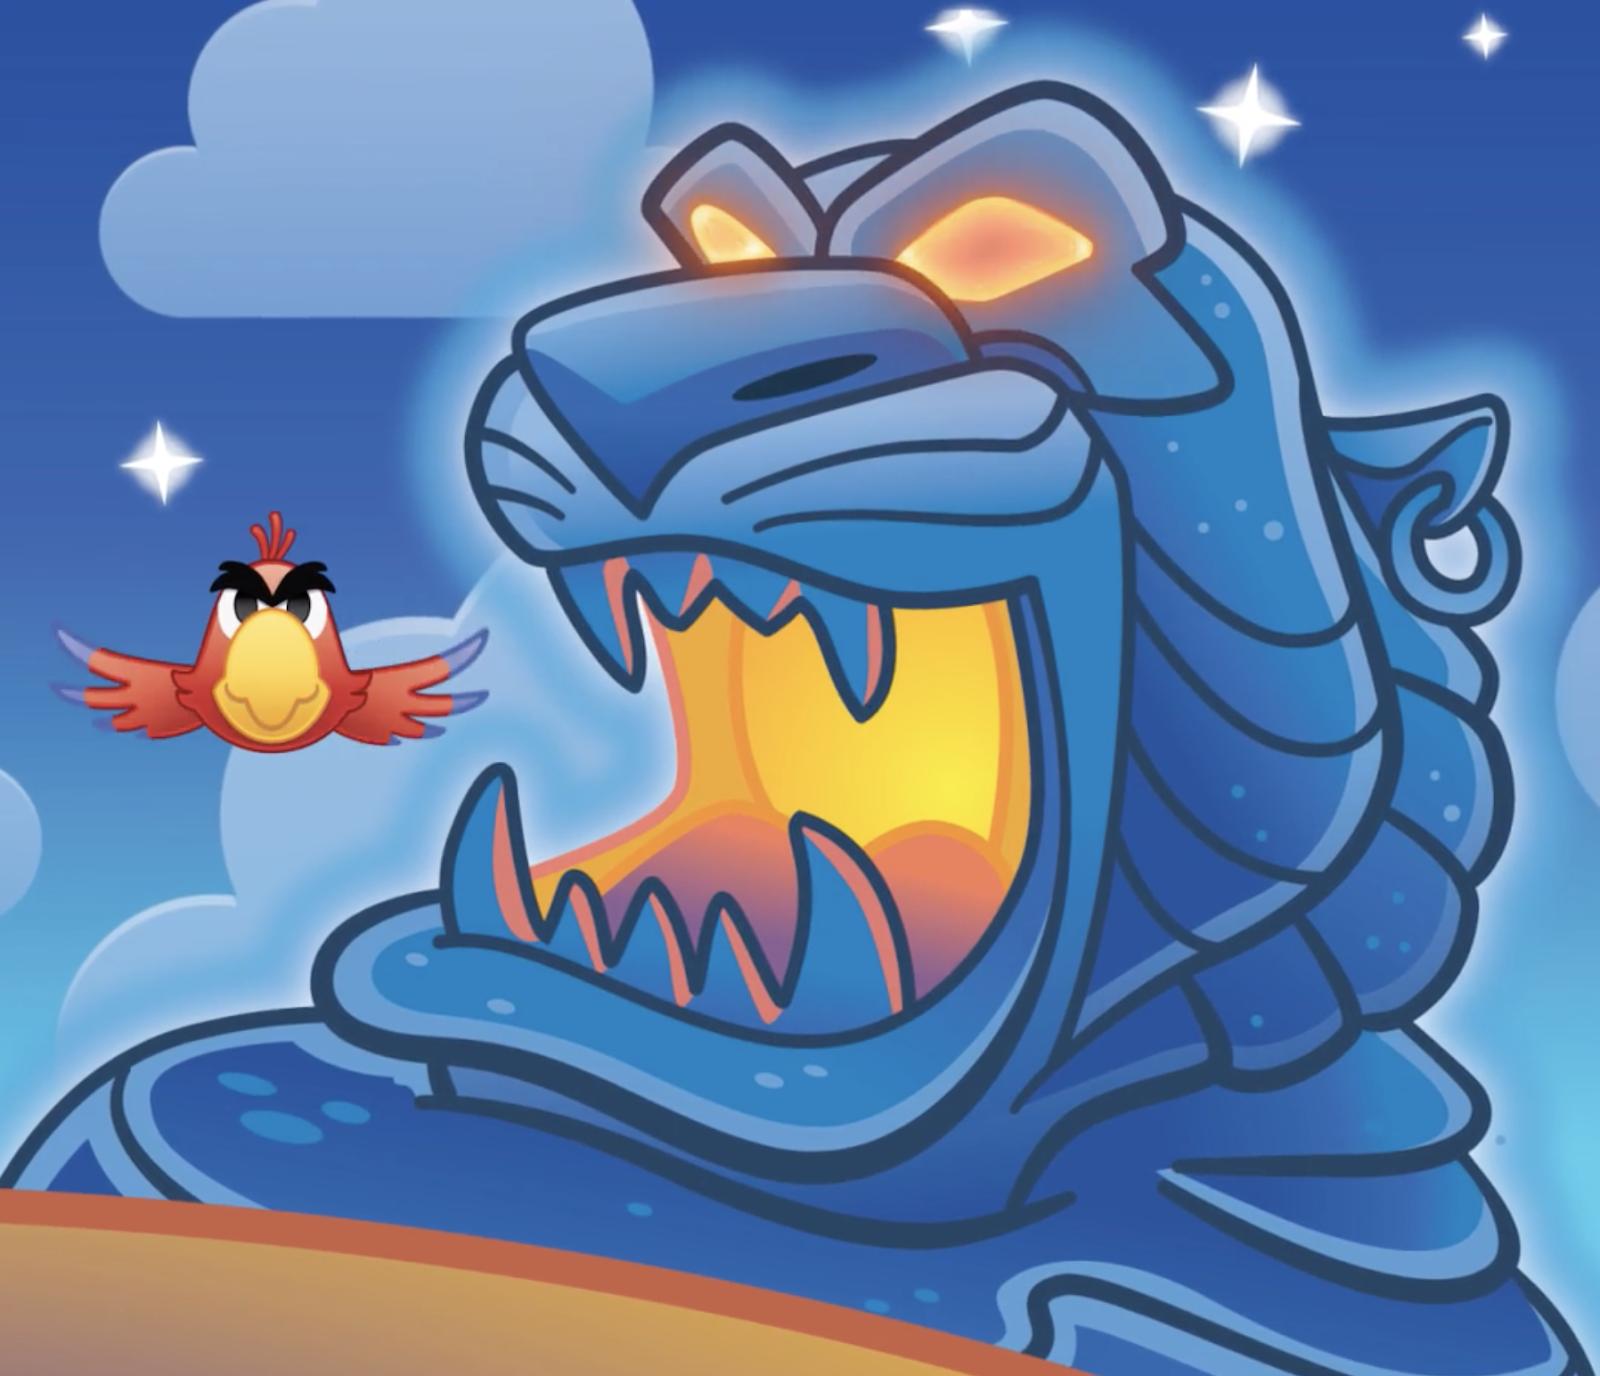 Disney Mobile Games Celebrate Premiere Of Aladdin With